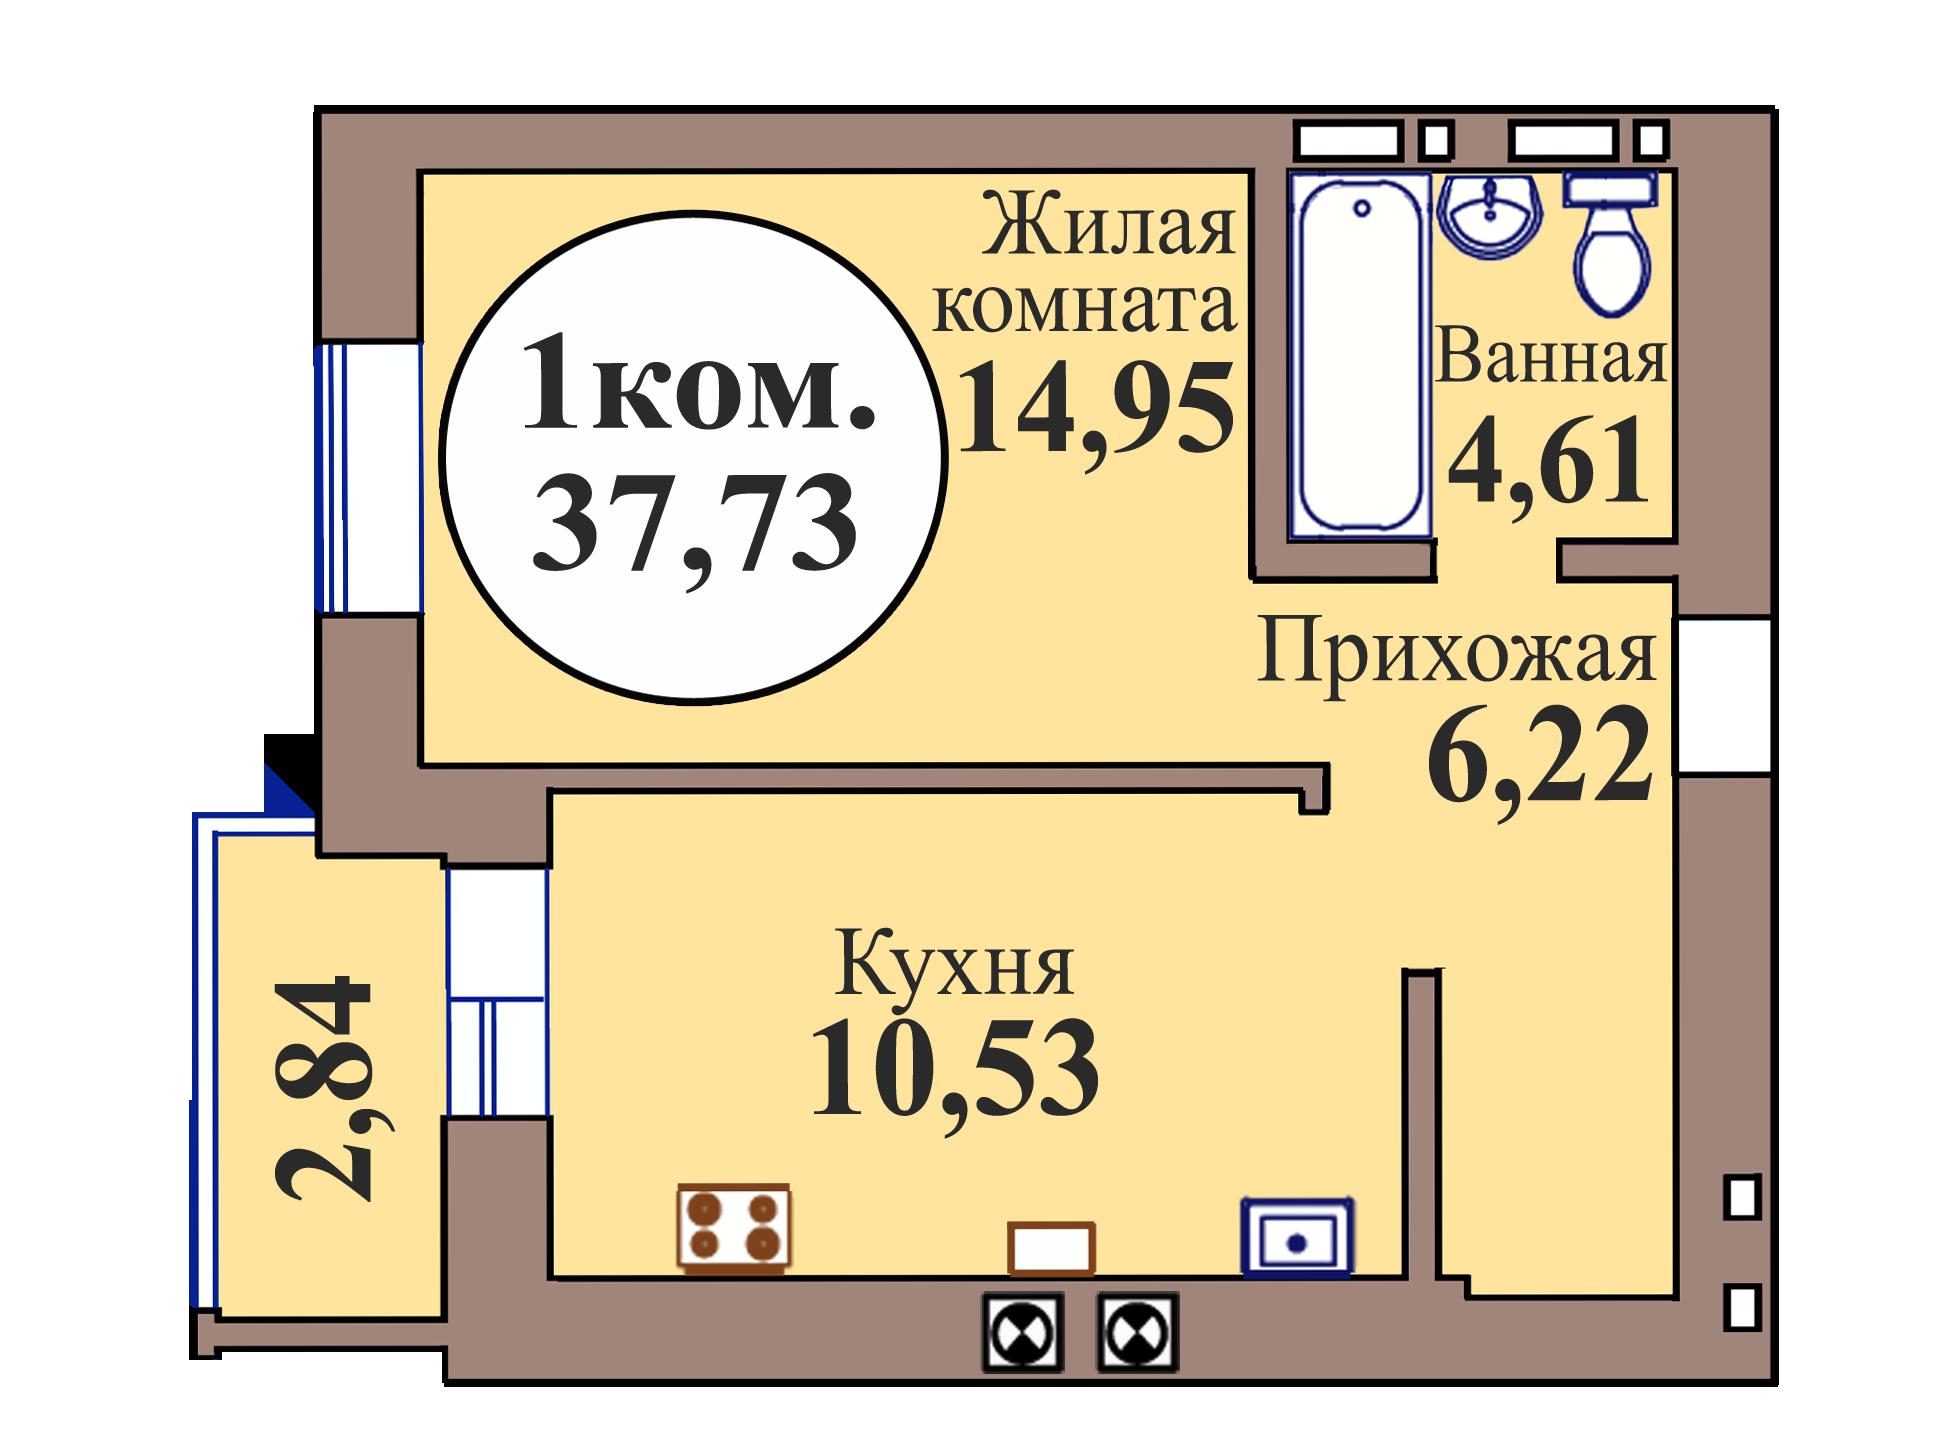 1-комн. кв. по пер. Калининградский, 5 кв. 232 в Калининграде